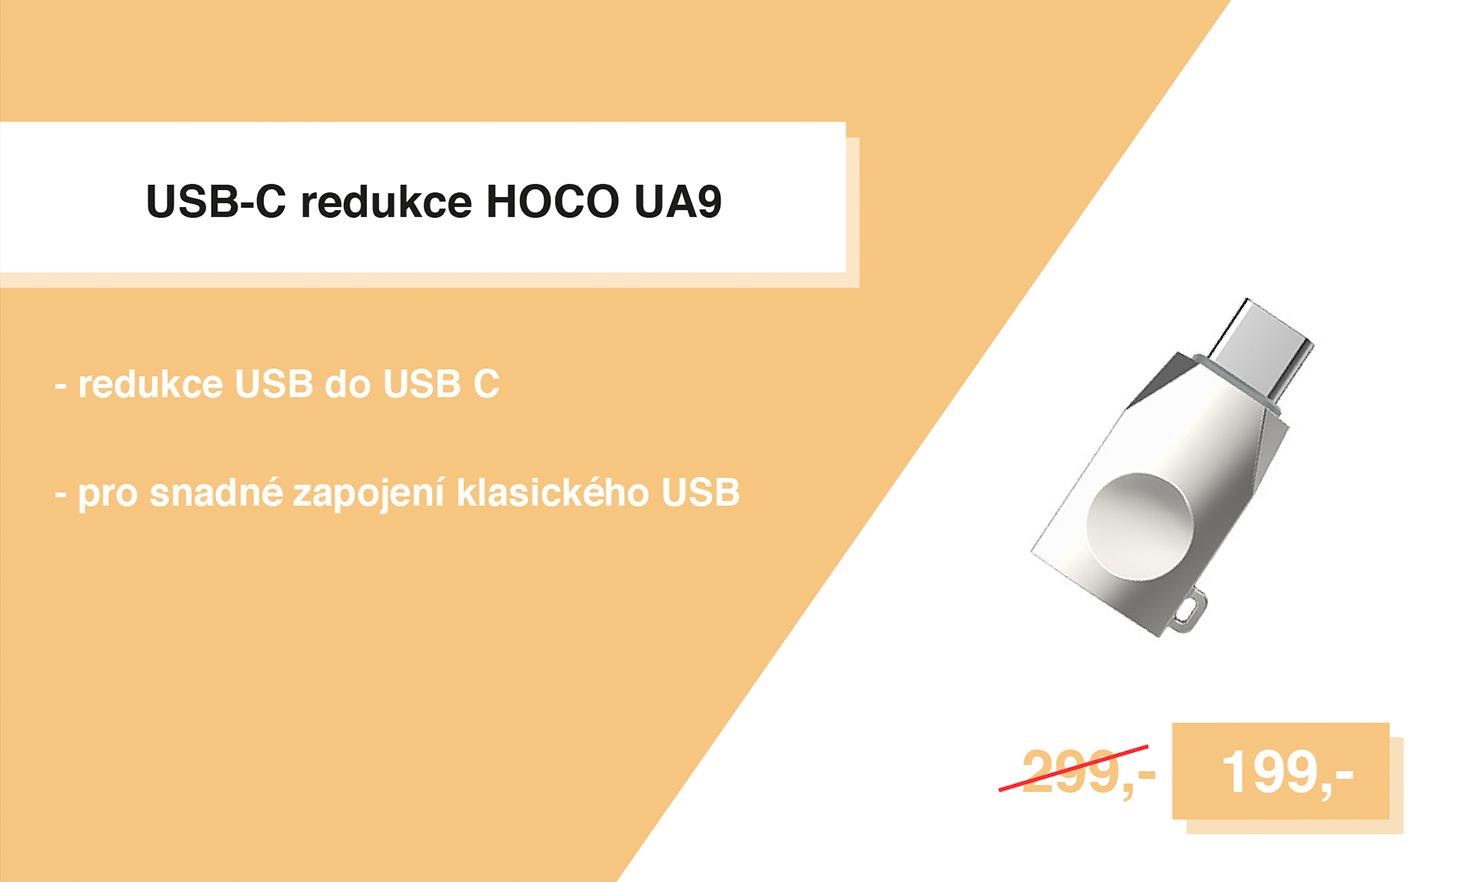 USB redukce HOCO